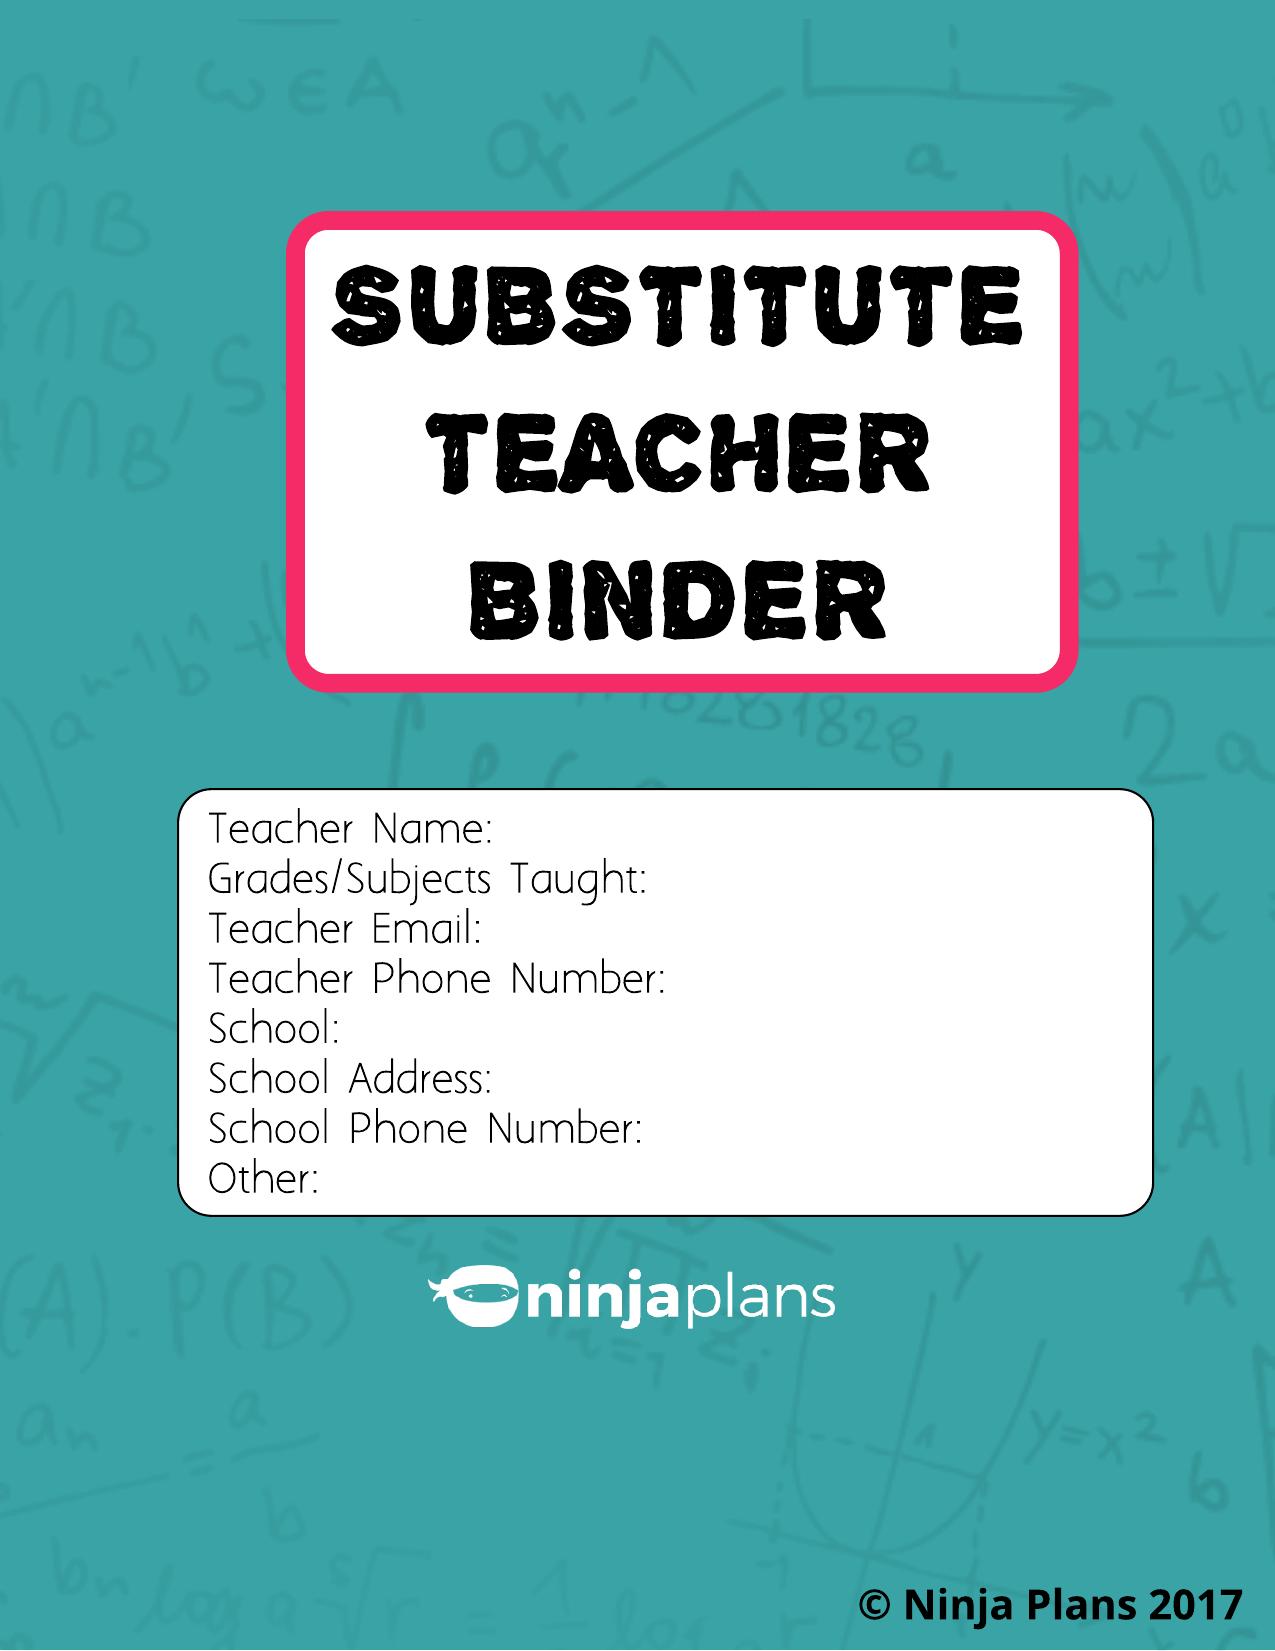 Substitute Teacher Binder Resource Preview